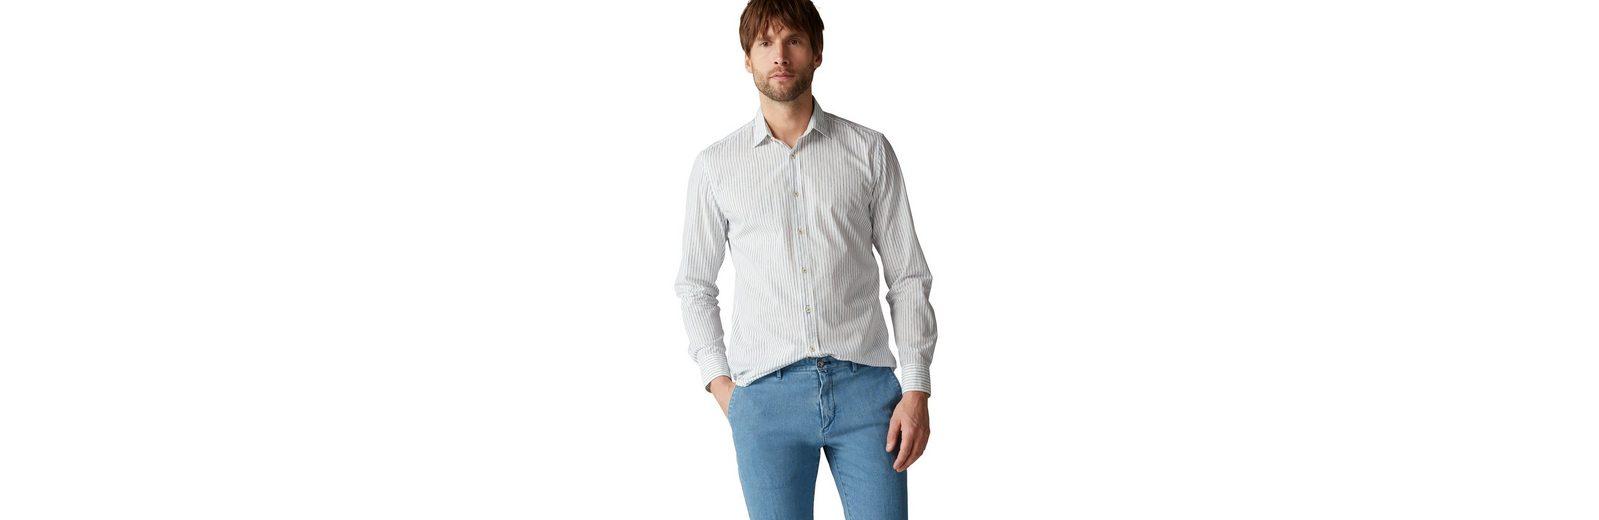 Marc O'Polo Langarmhemd Gefälschte Online 6TVJJfd